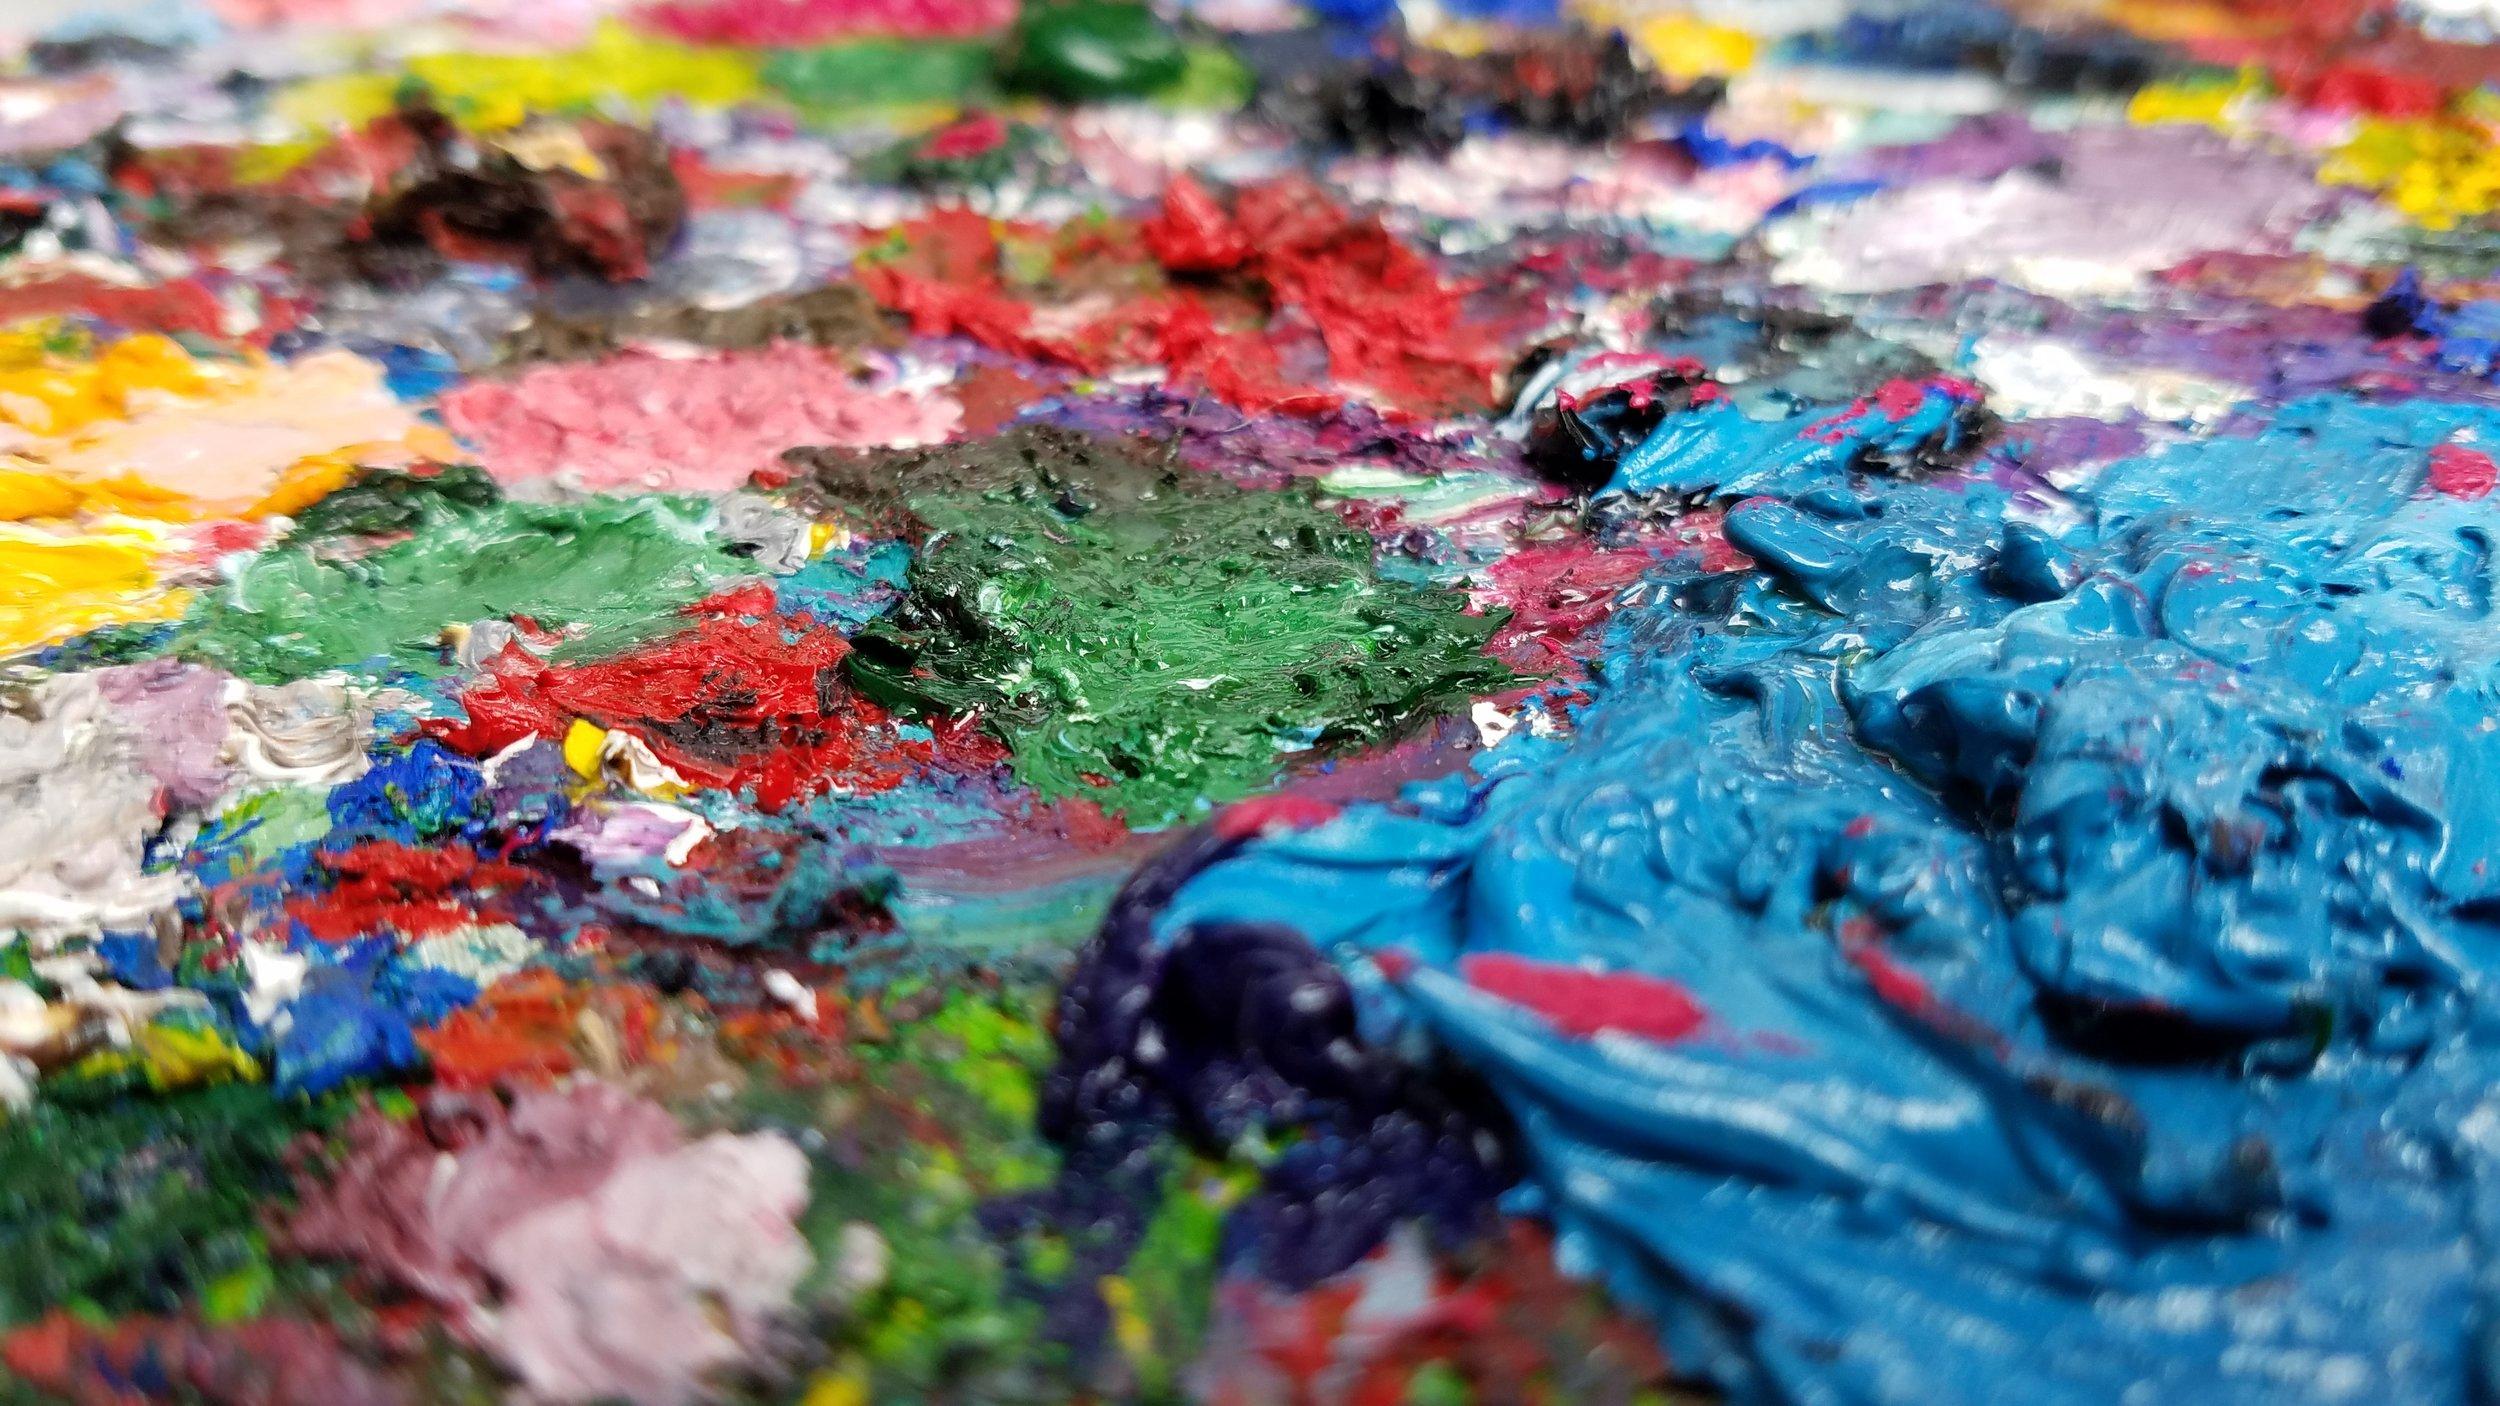 paint jenna-s-416404-unsplash.jpg